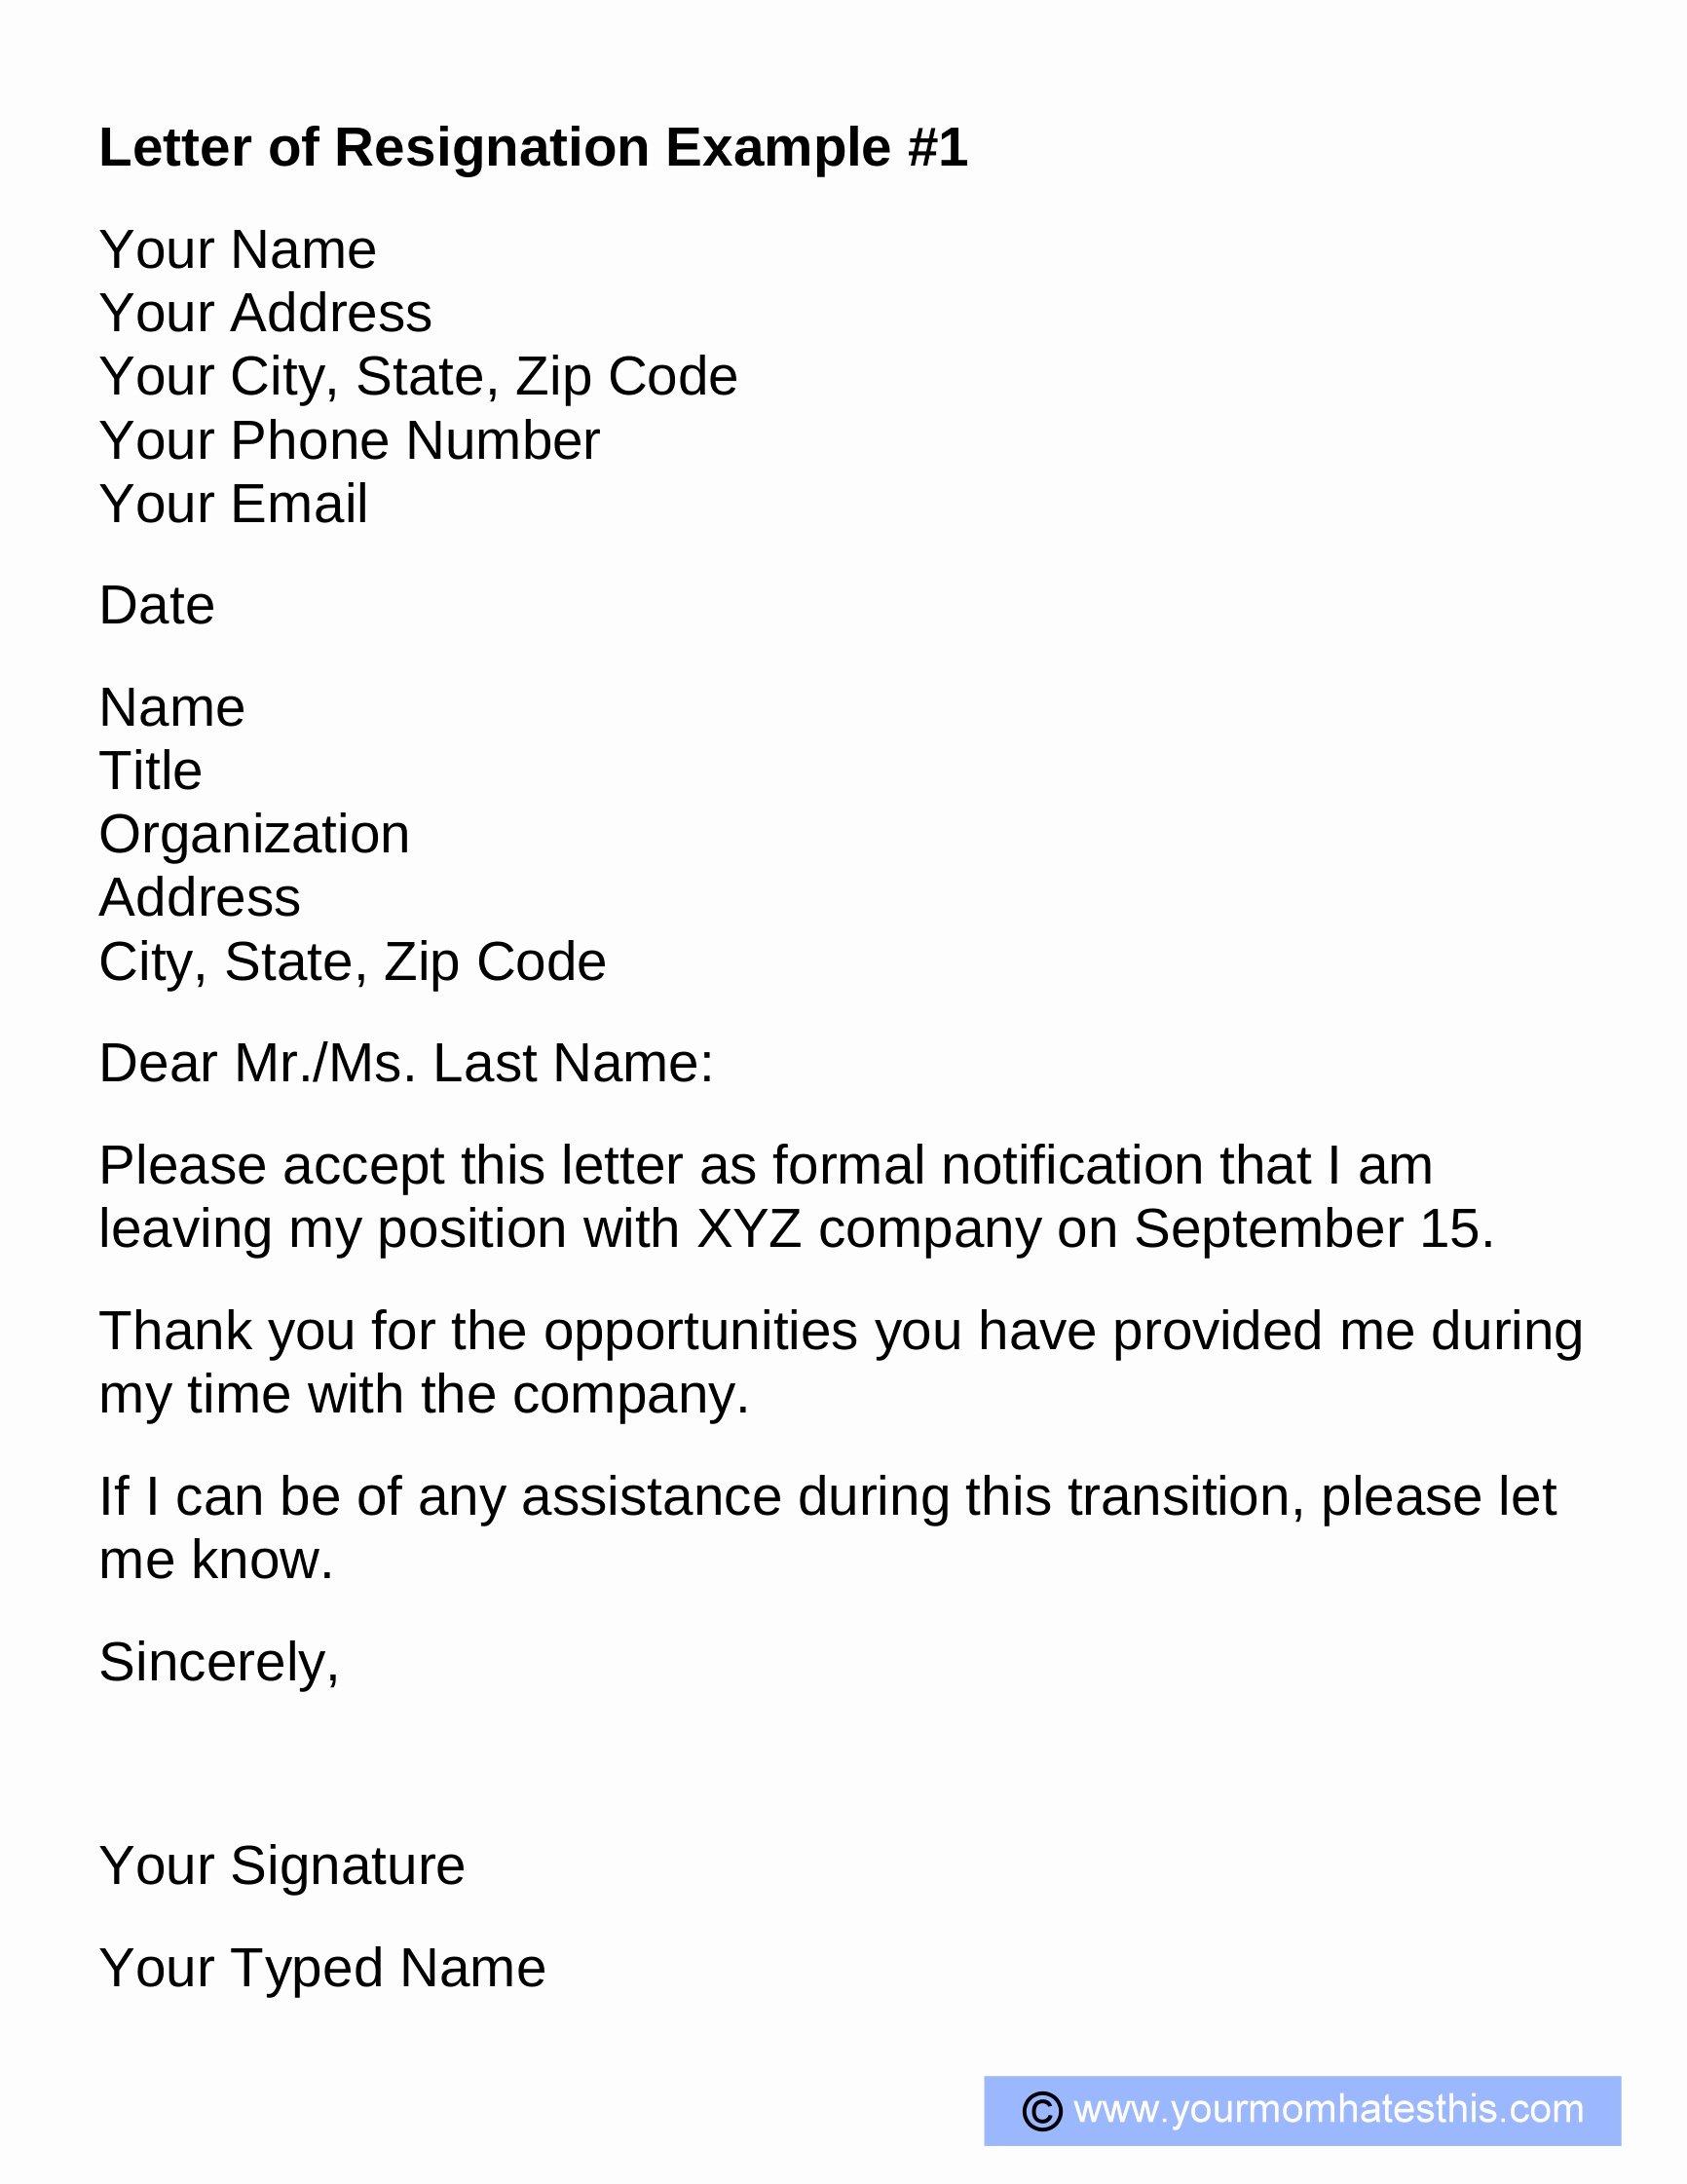 Samples Letter Of Resignation Beautiful Download Resignation Letter Pdf & Doc